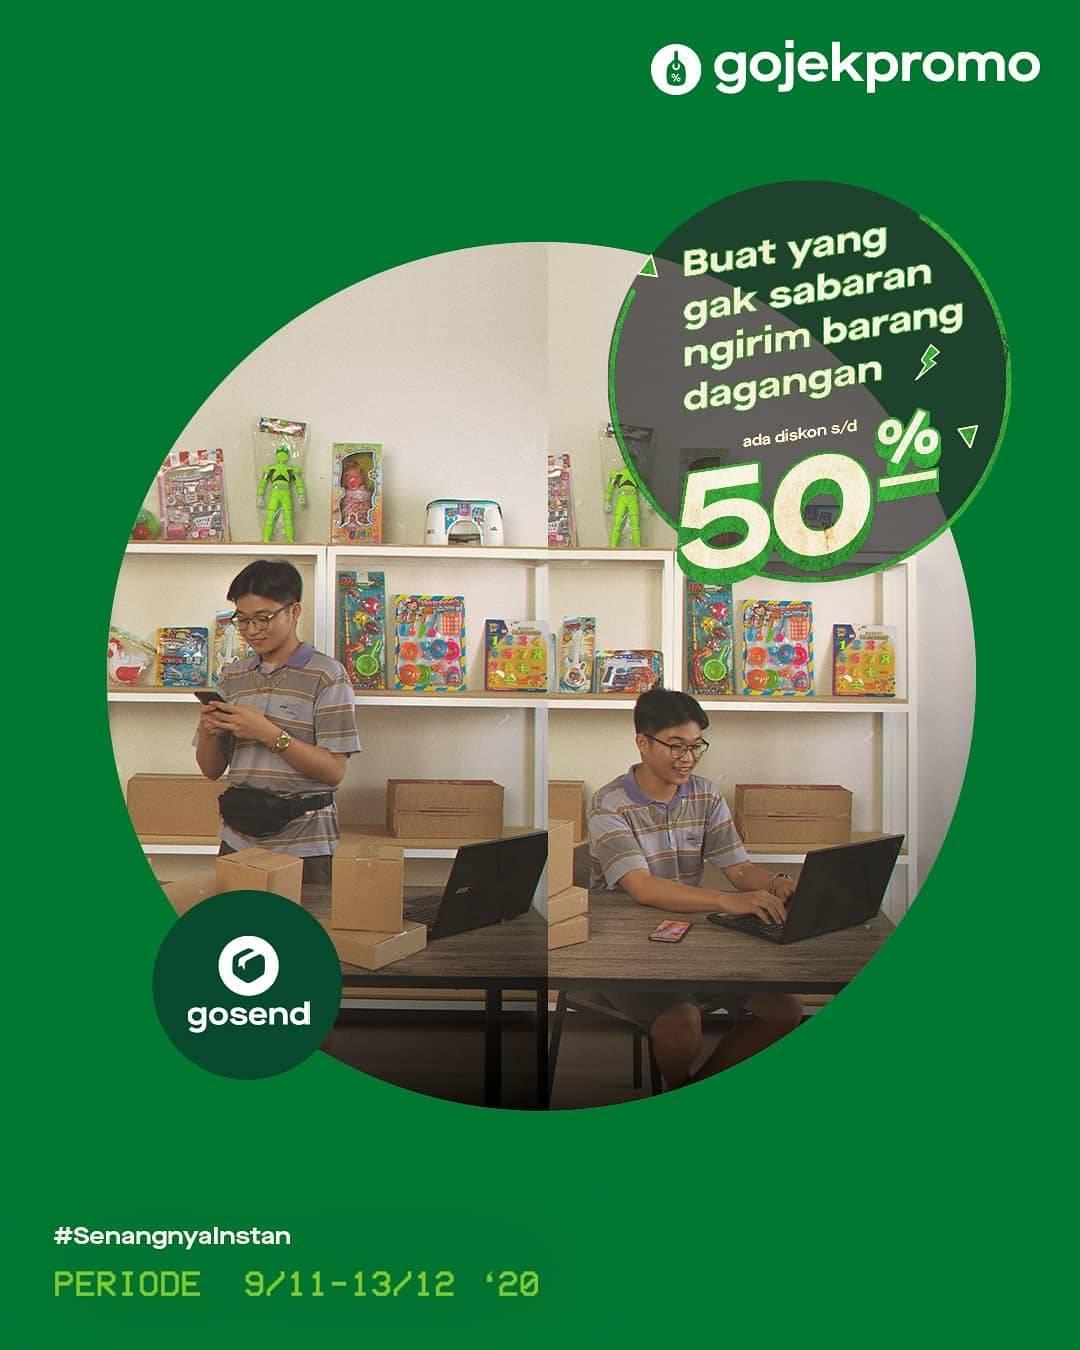 Diskon Gojek Diskon 50% Pakai Gosend Web Portal & Selly